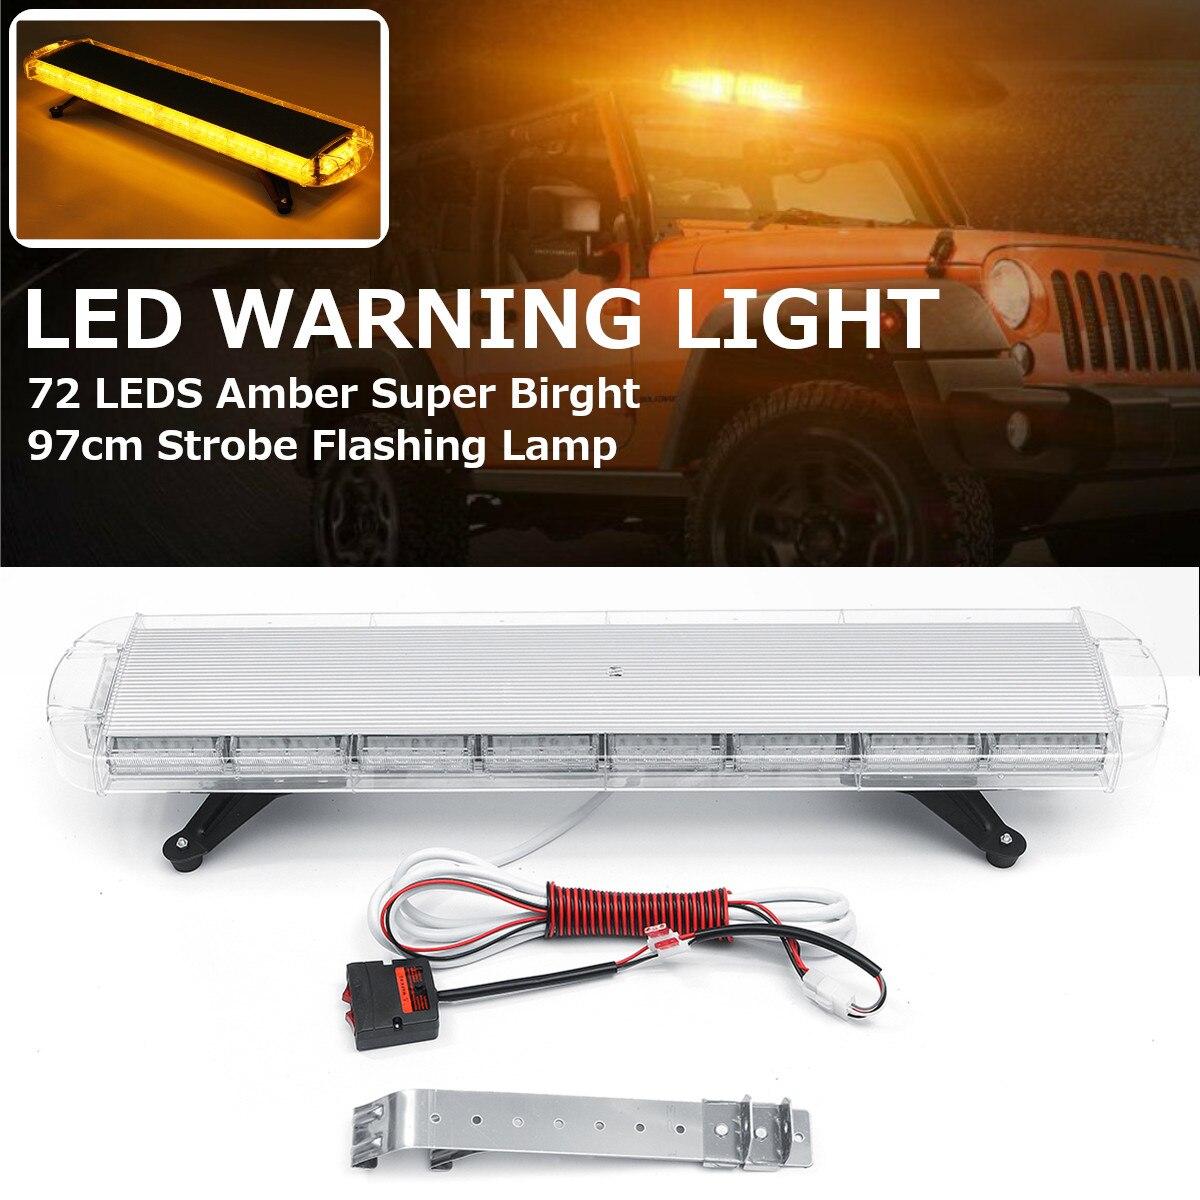 12 24v 40 inch 72W 72 LED Car Strobe Emergency Amber Lights Bar Beacon Hazard Warning Flash Lamp